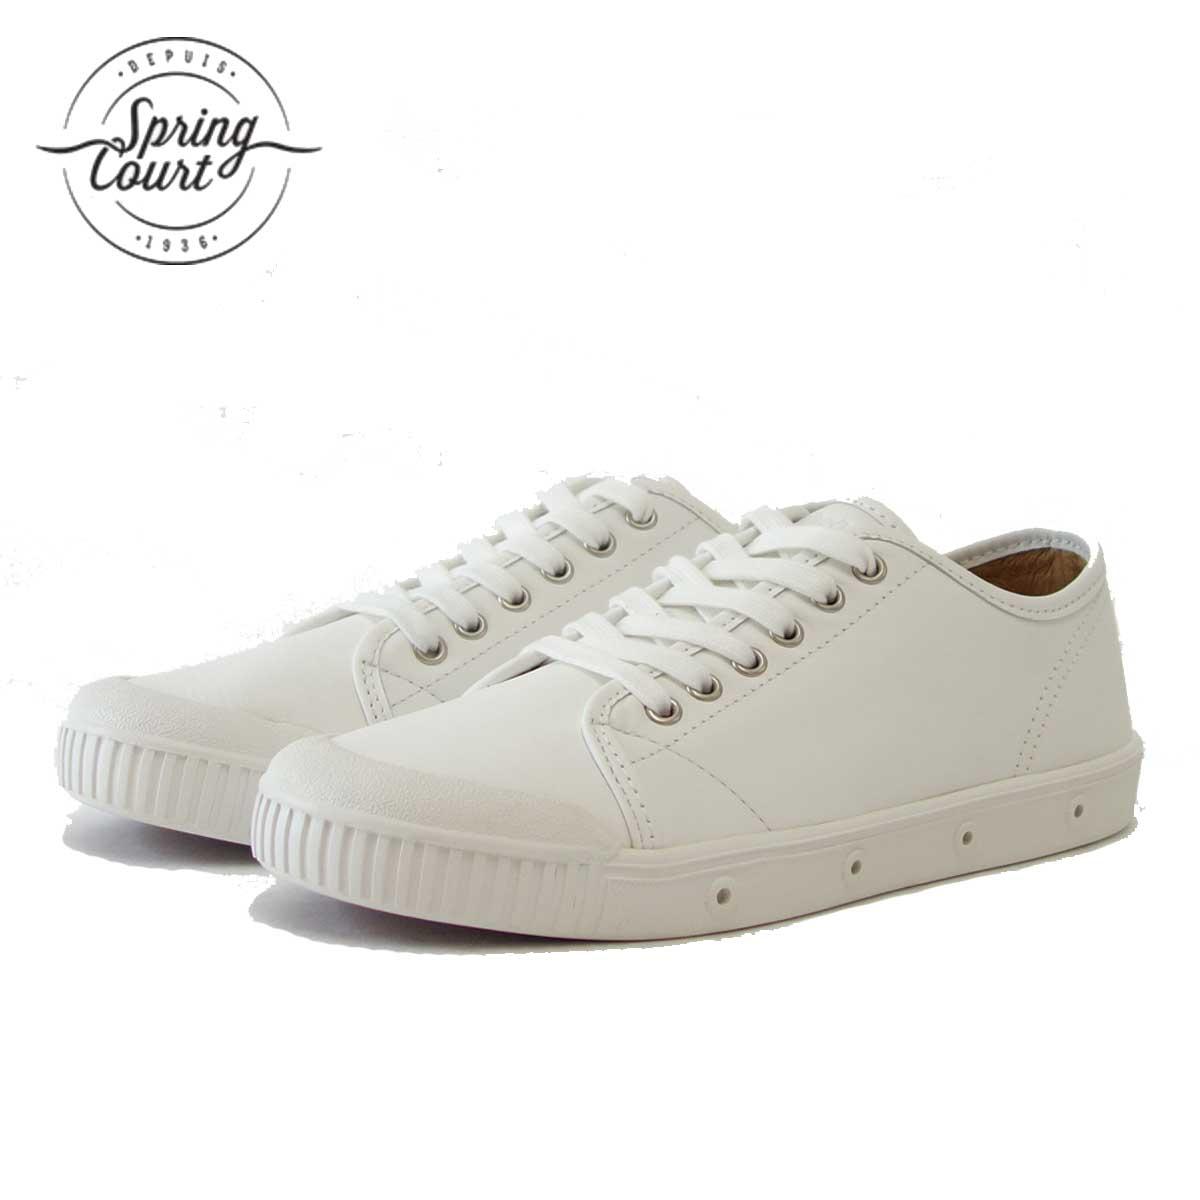 Spring Court スプリングコート G2S-V5(レディース)G2 Leather WHITE 天然皮革のローカットスニーカー 「靴」